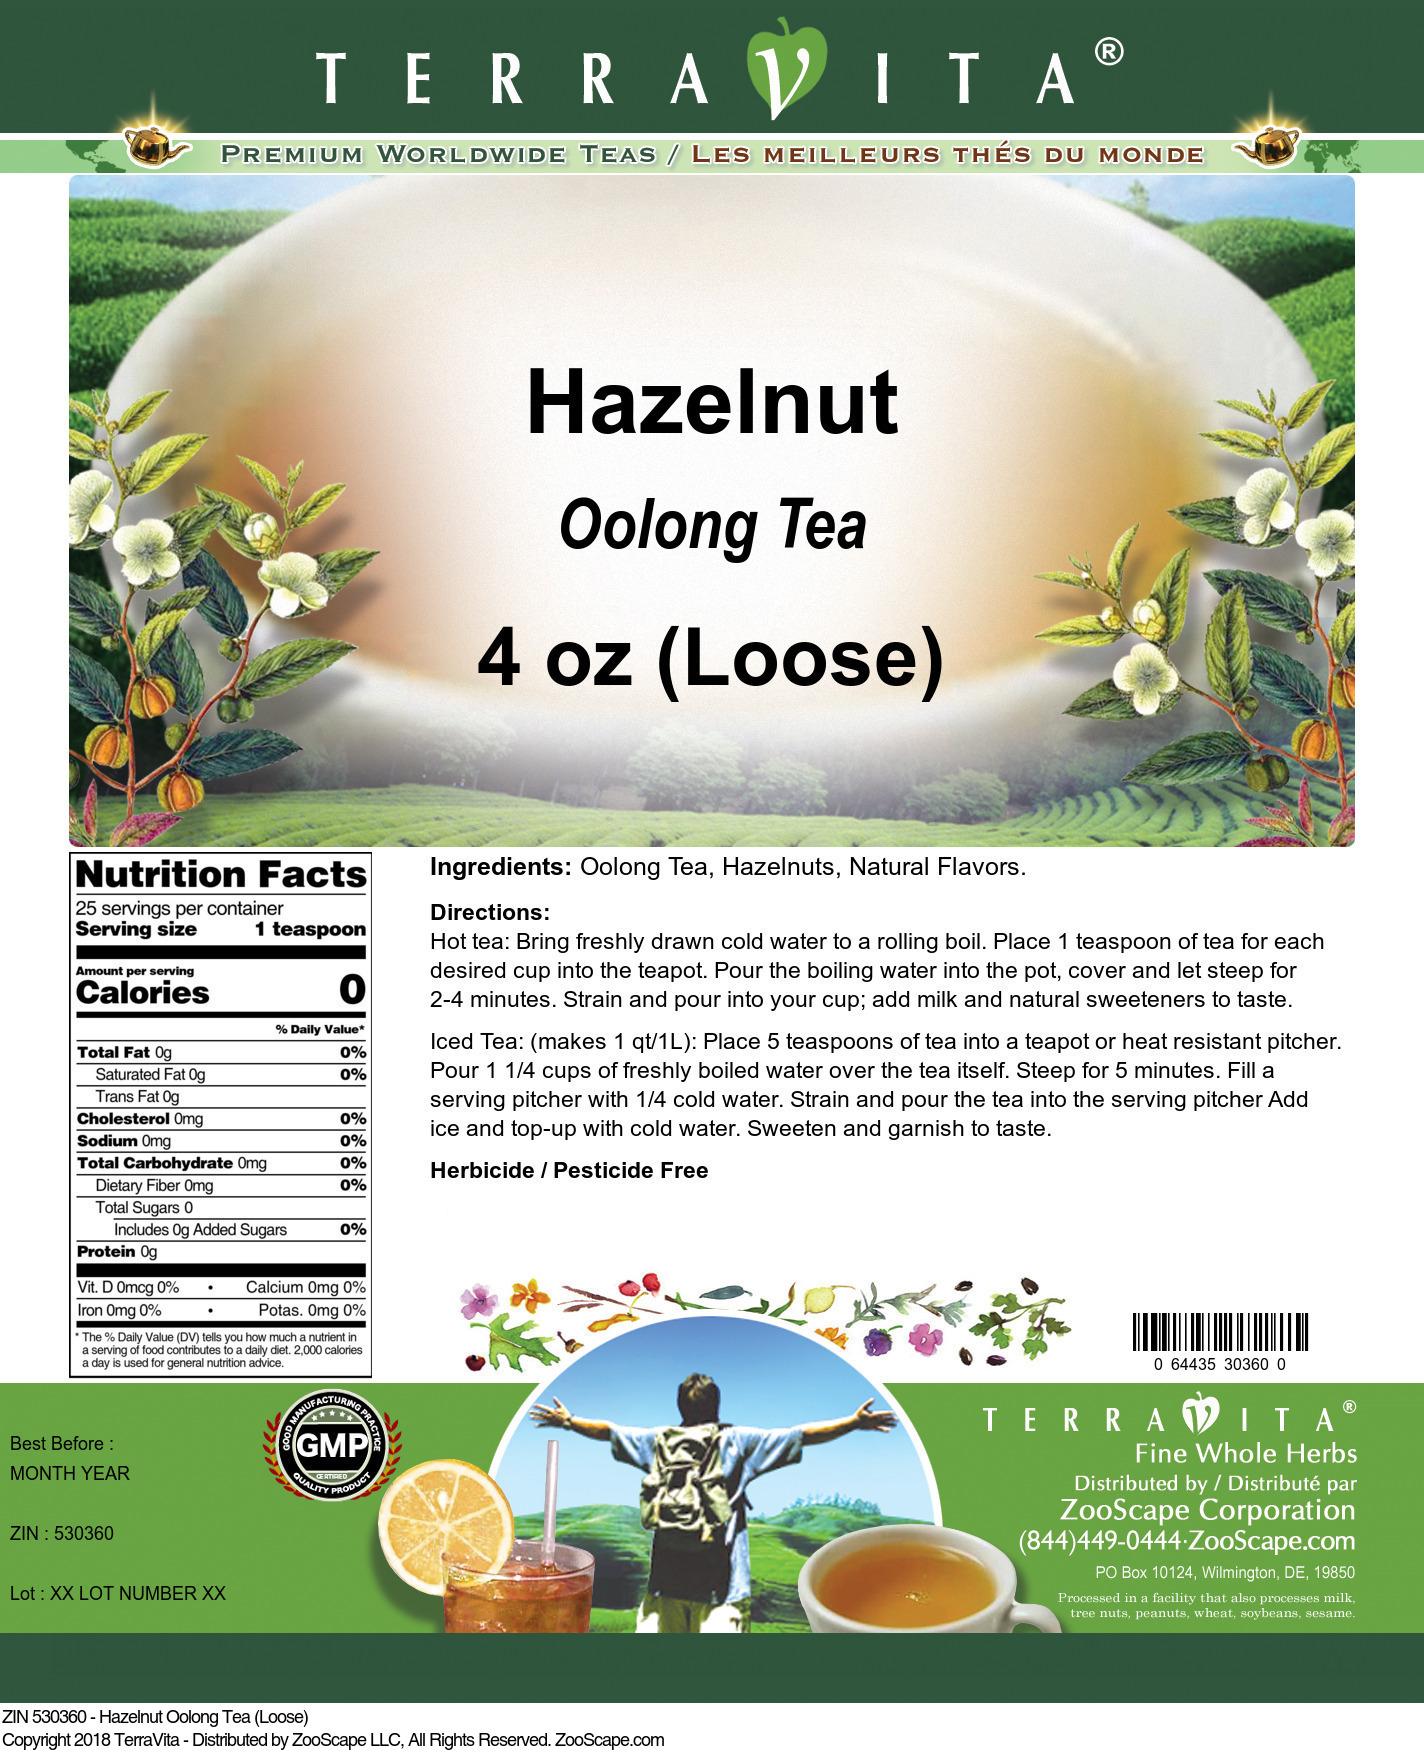 Hazelnut Oolong Tea